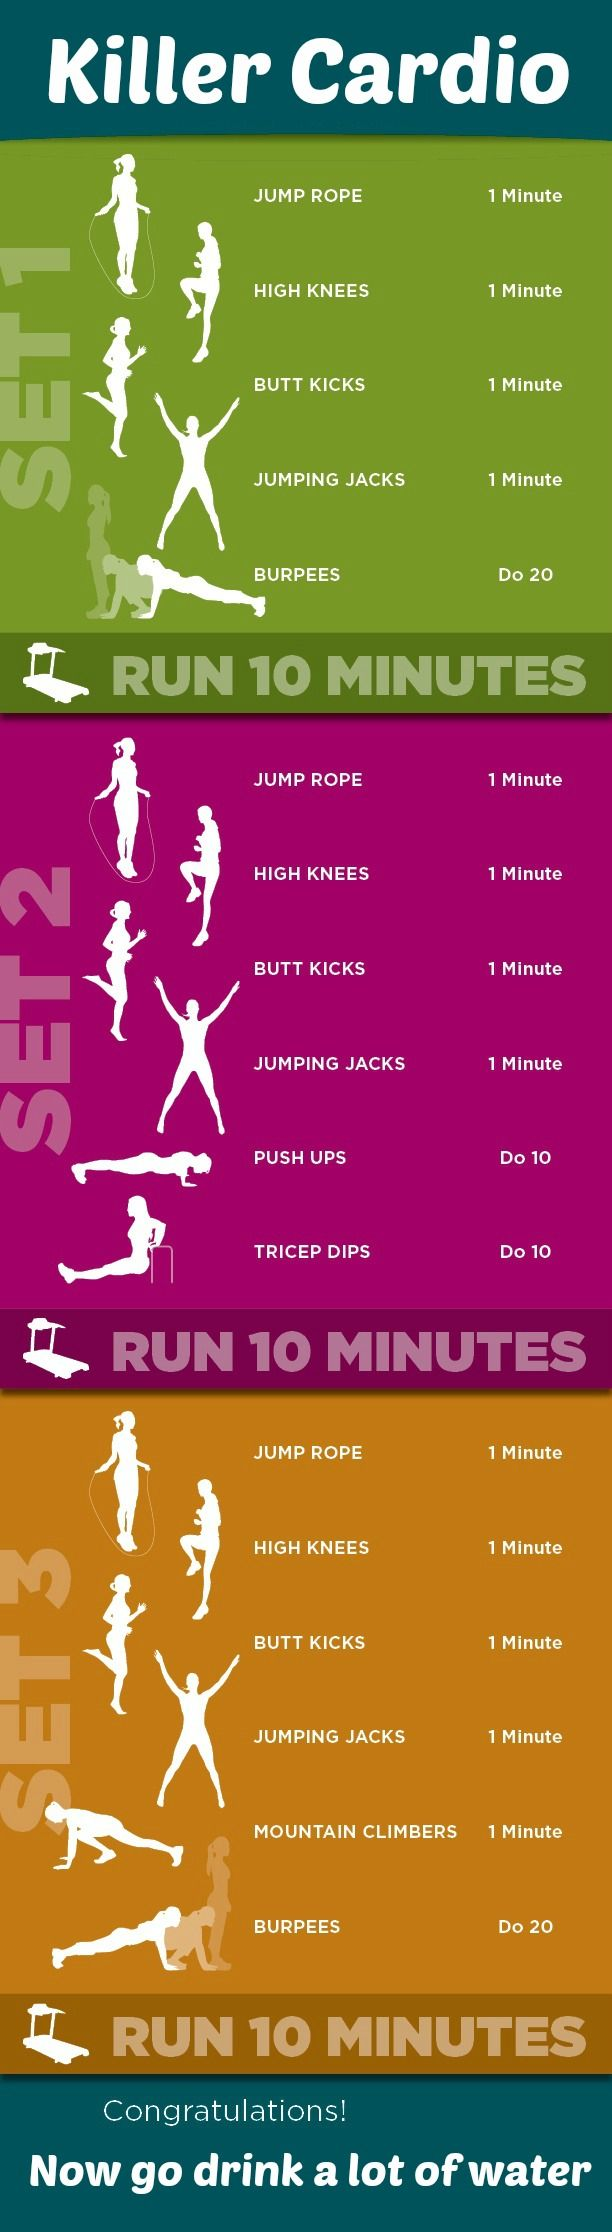 cardio-workout